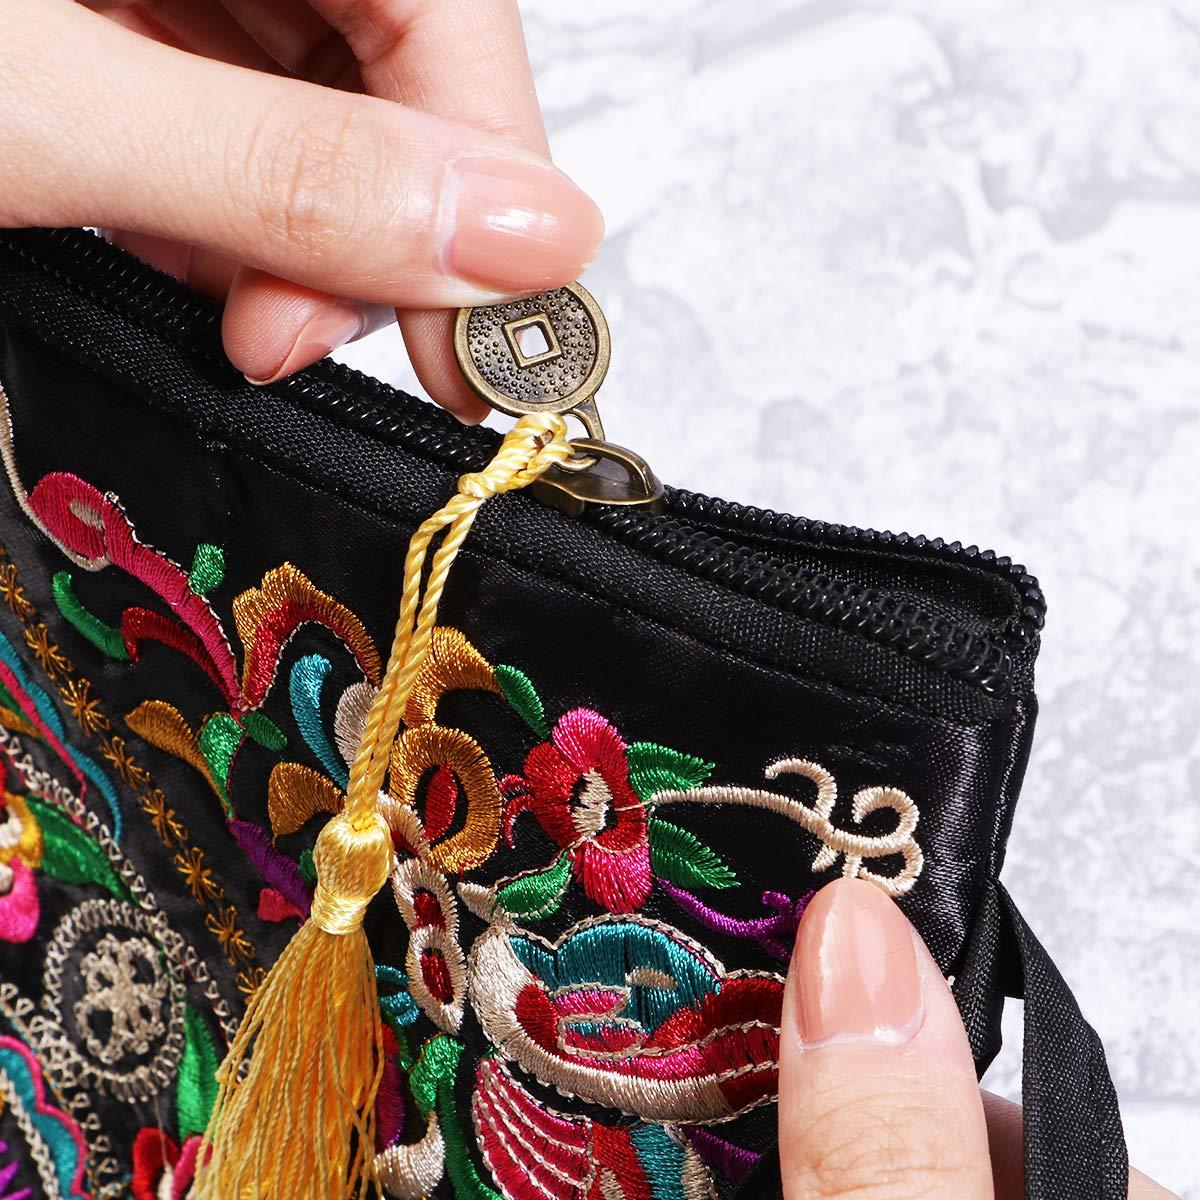 819B%2BtoF%2BxL - Tinksky Vintage Mujer étnica Monedero Cartera Bolsa Mariposa Flor teléfono